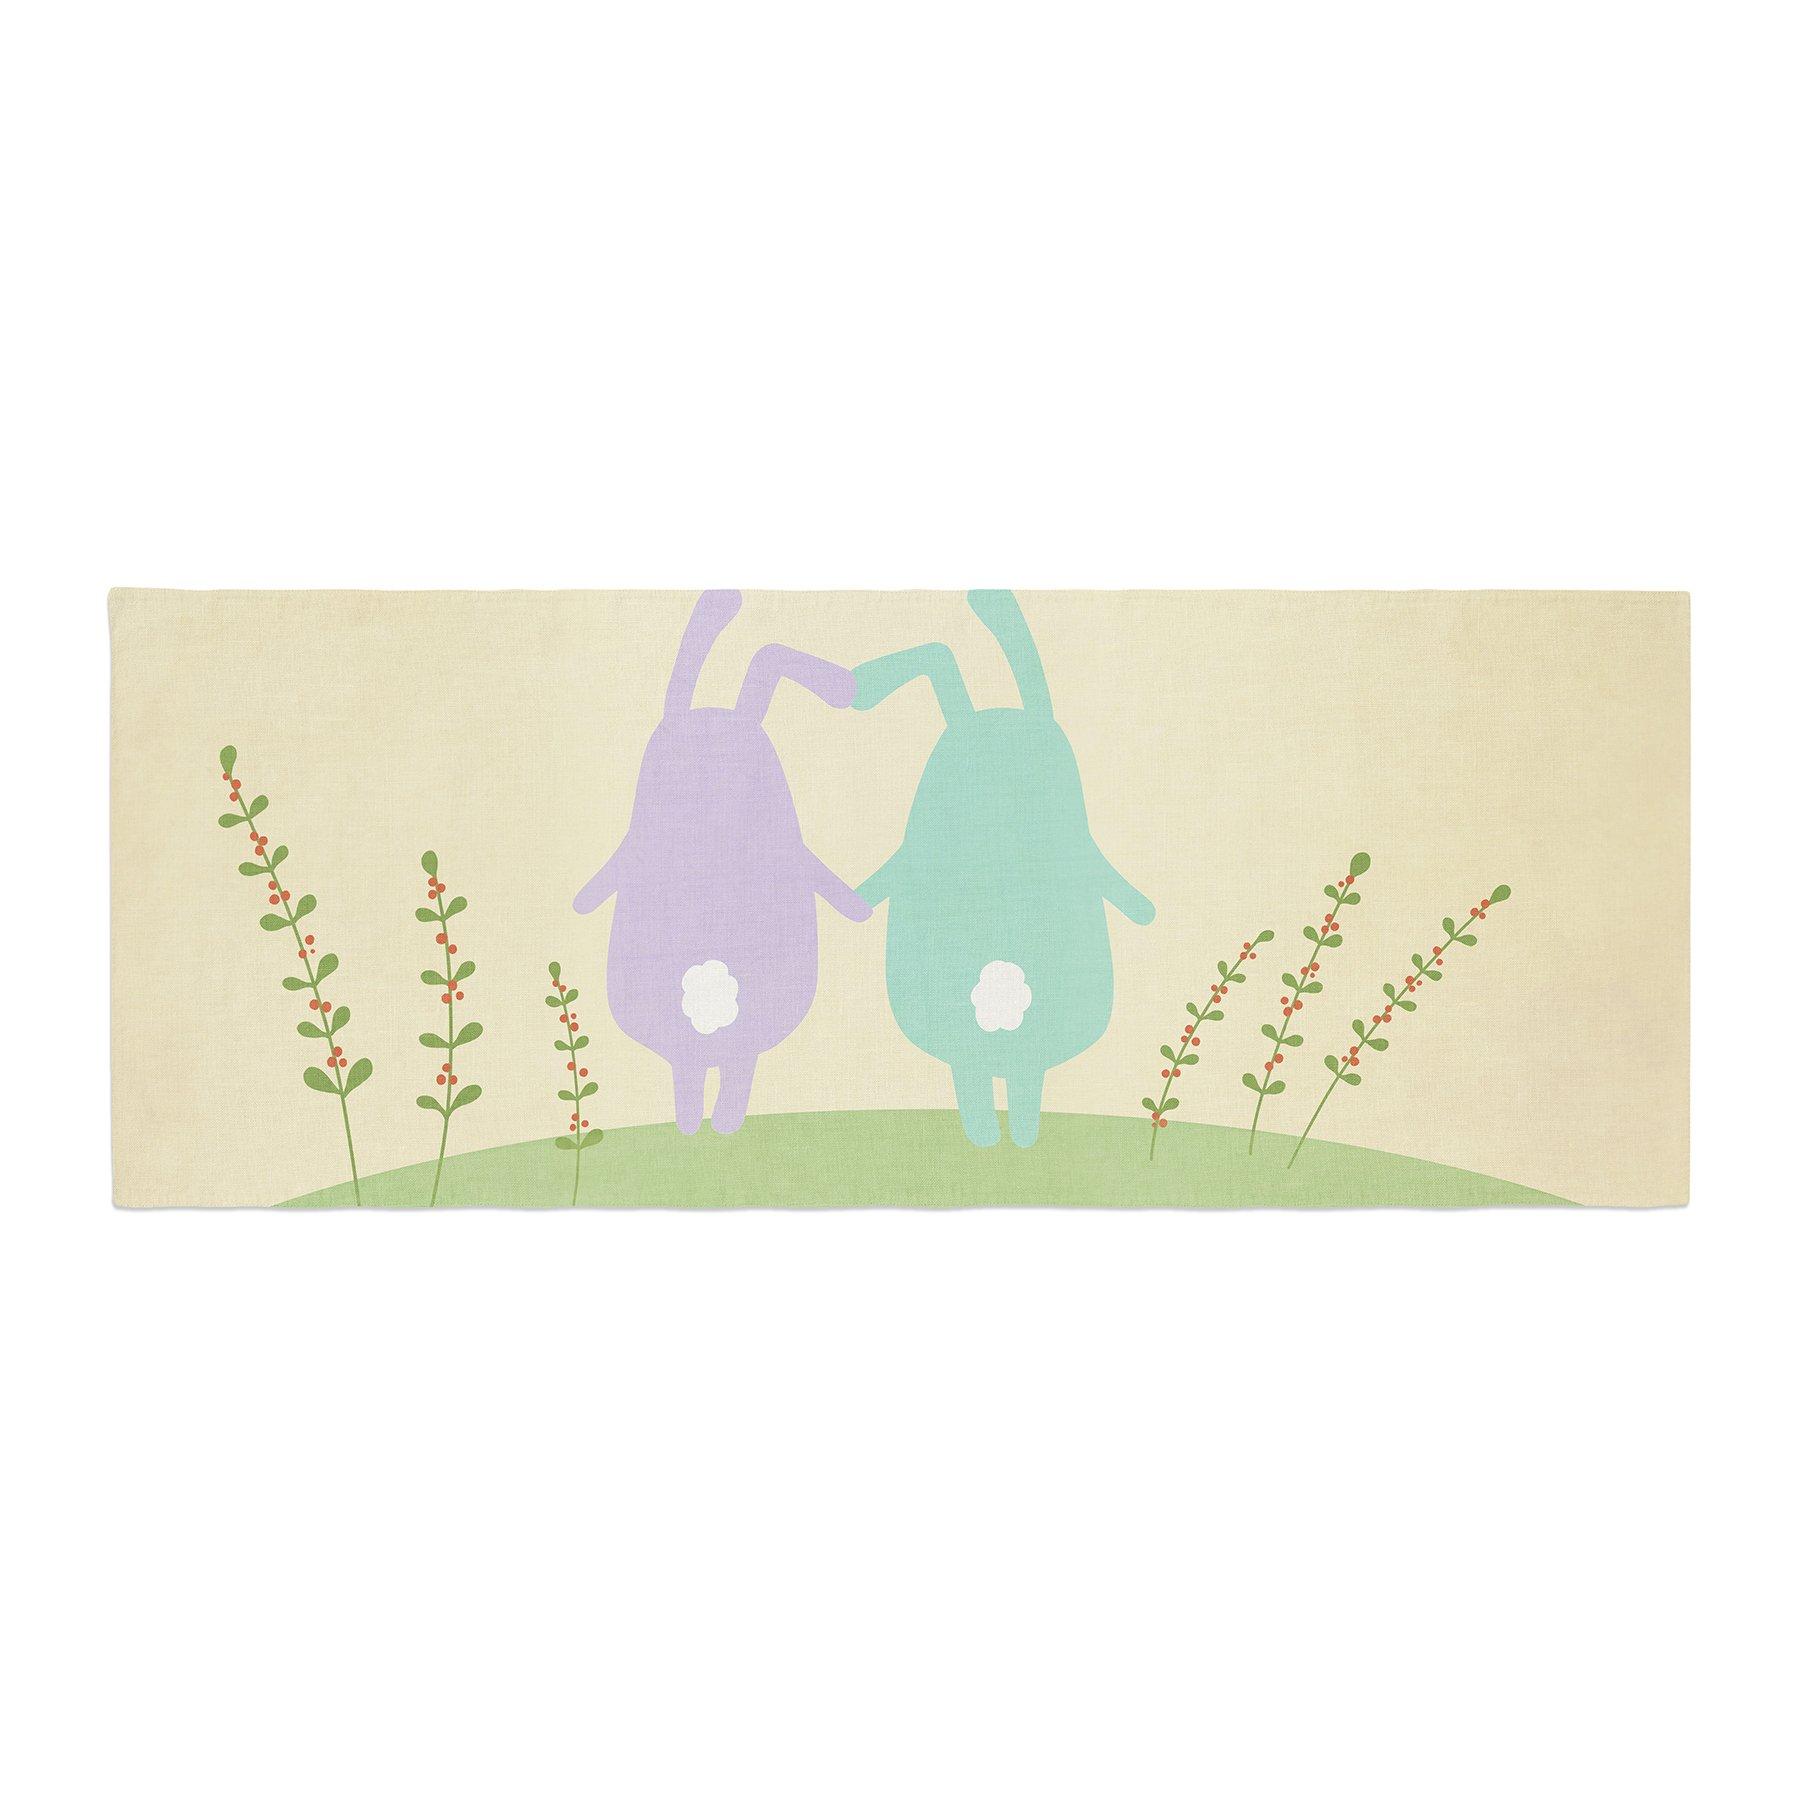 Kess InHouse Cristina bianco Design Cute Bunnies Beige Animals Bed Runner, 34'' x 86''